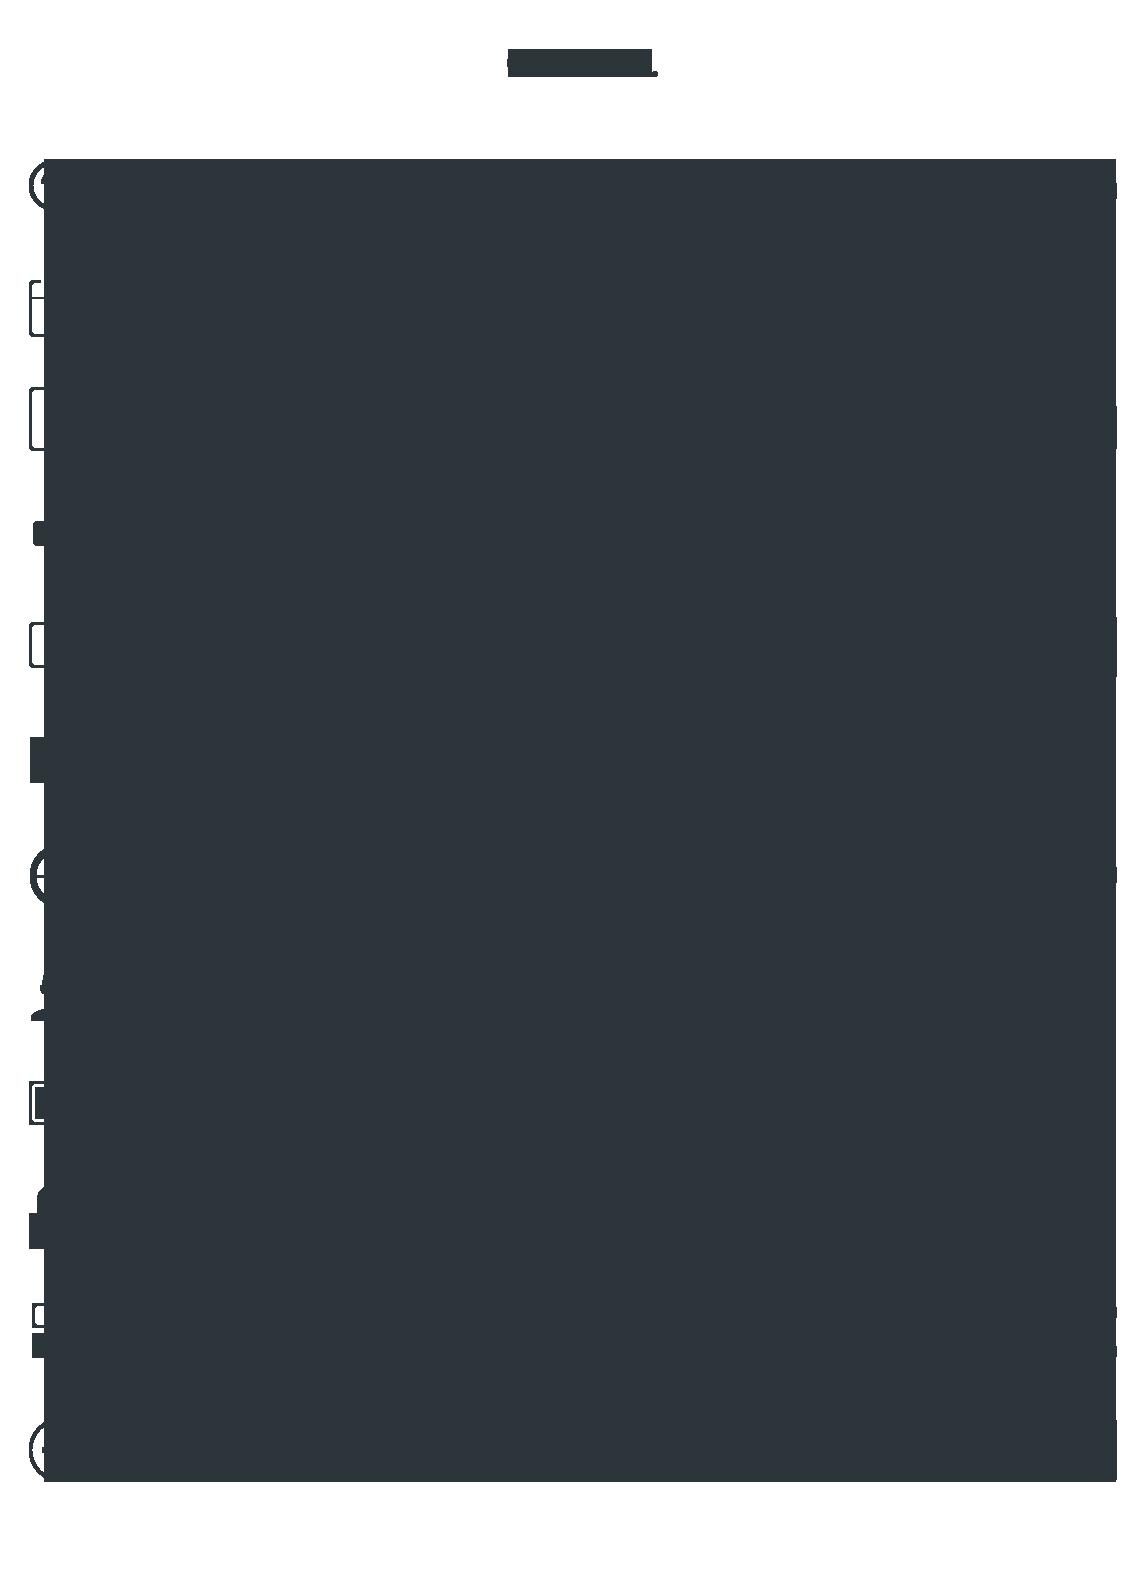 GICON Icon Set FREE.PSD Web design freebies, Vector icons